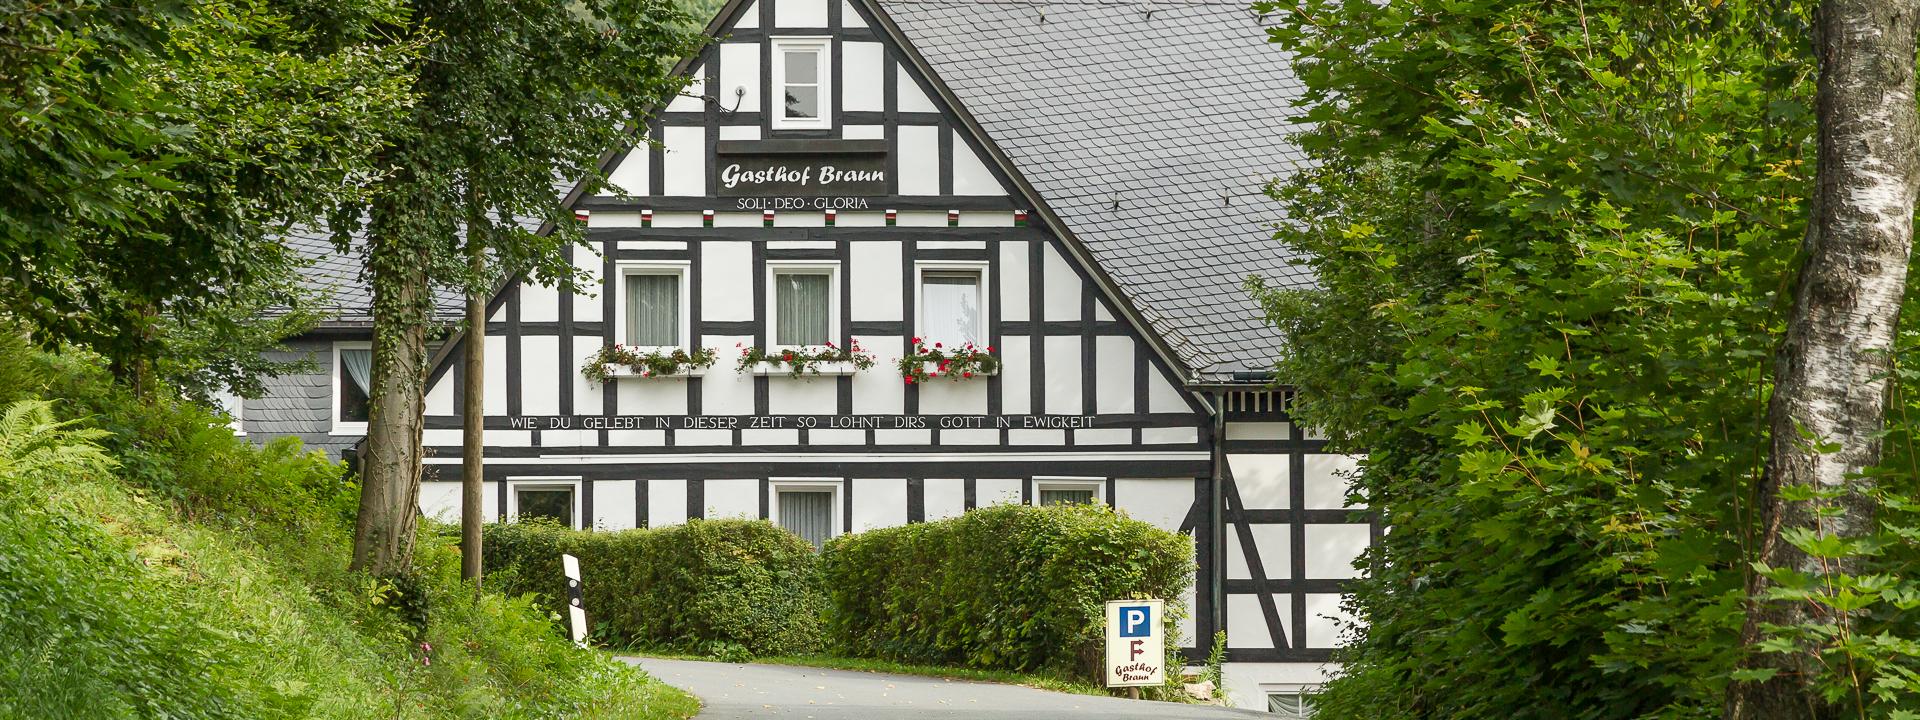 Gasthof Braun